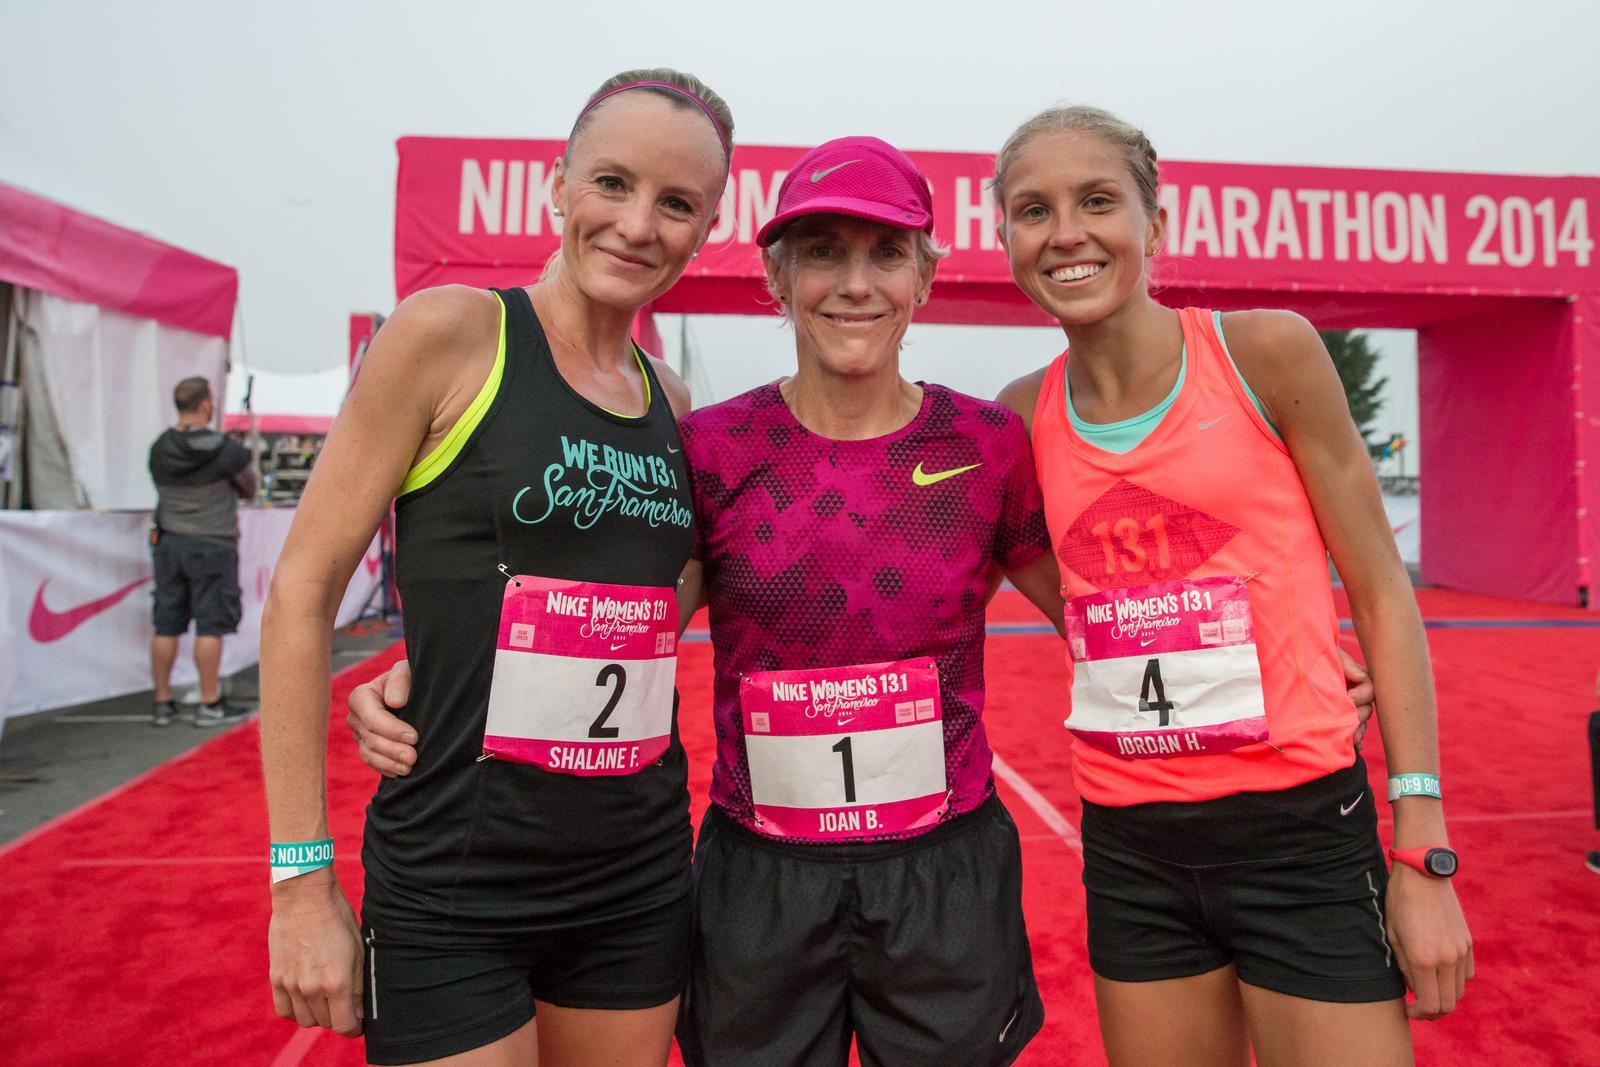 nike women�s half marathon celebrates 25000 runners in